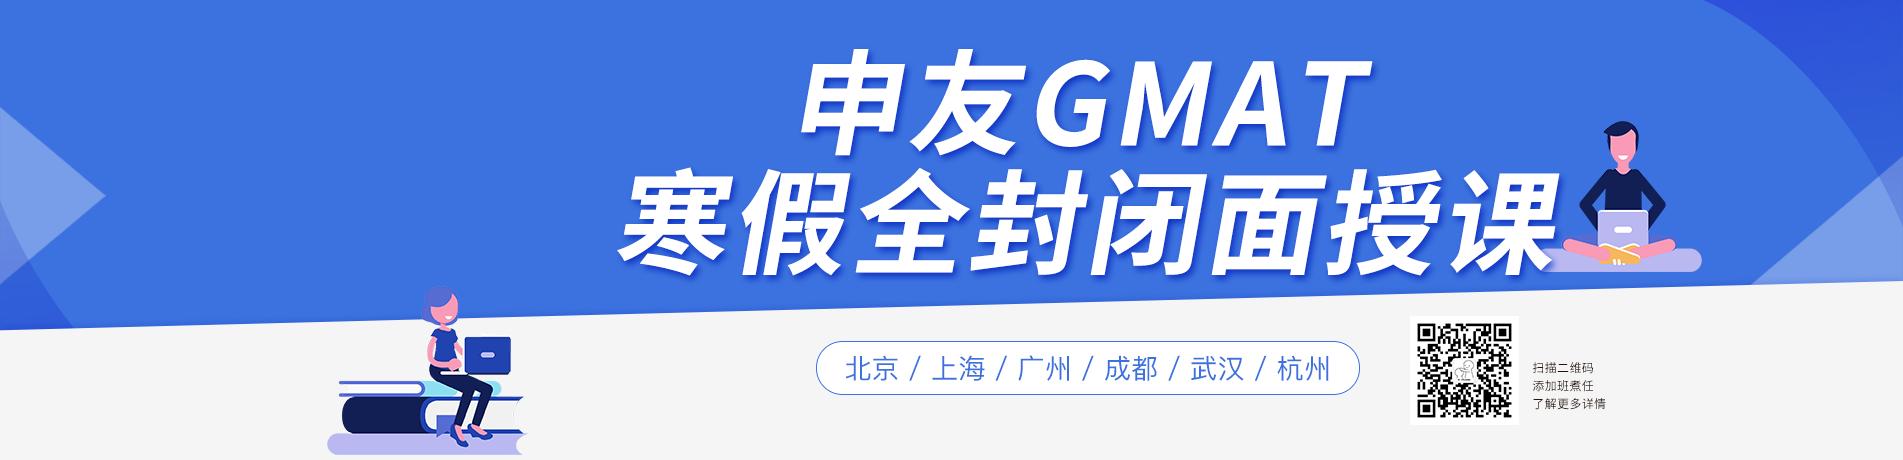 GMAT寒假封闭班全国2019